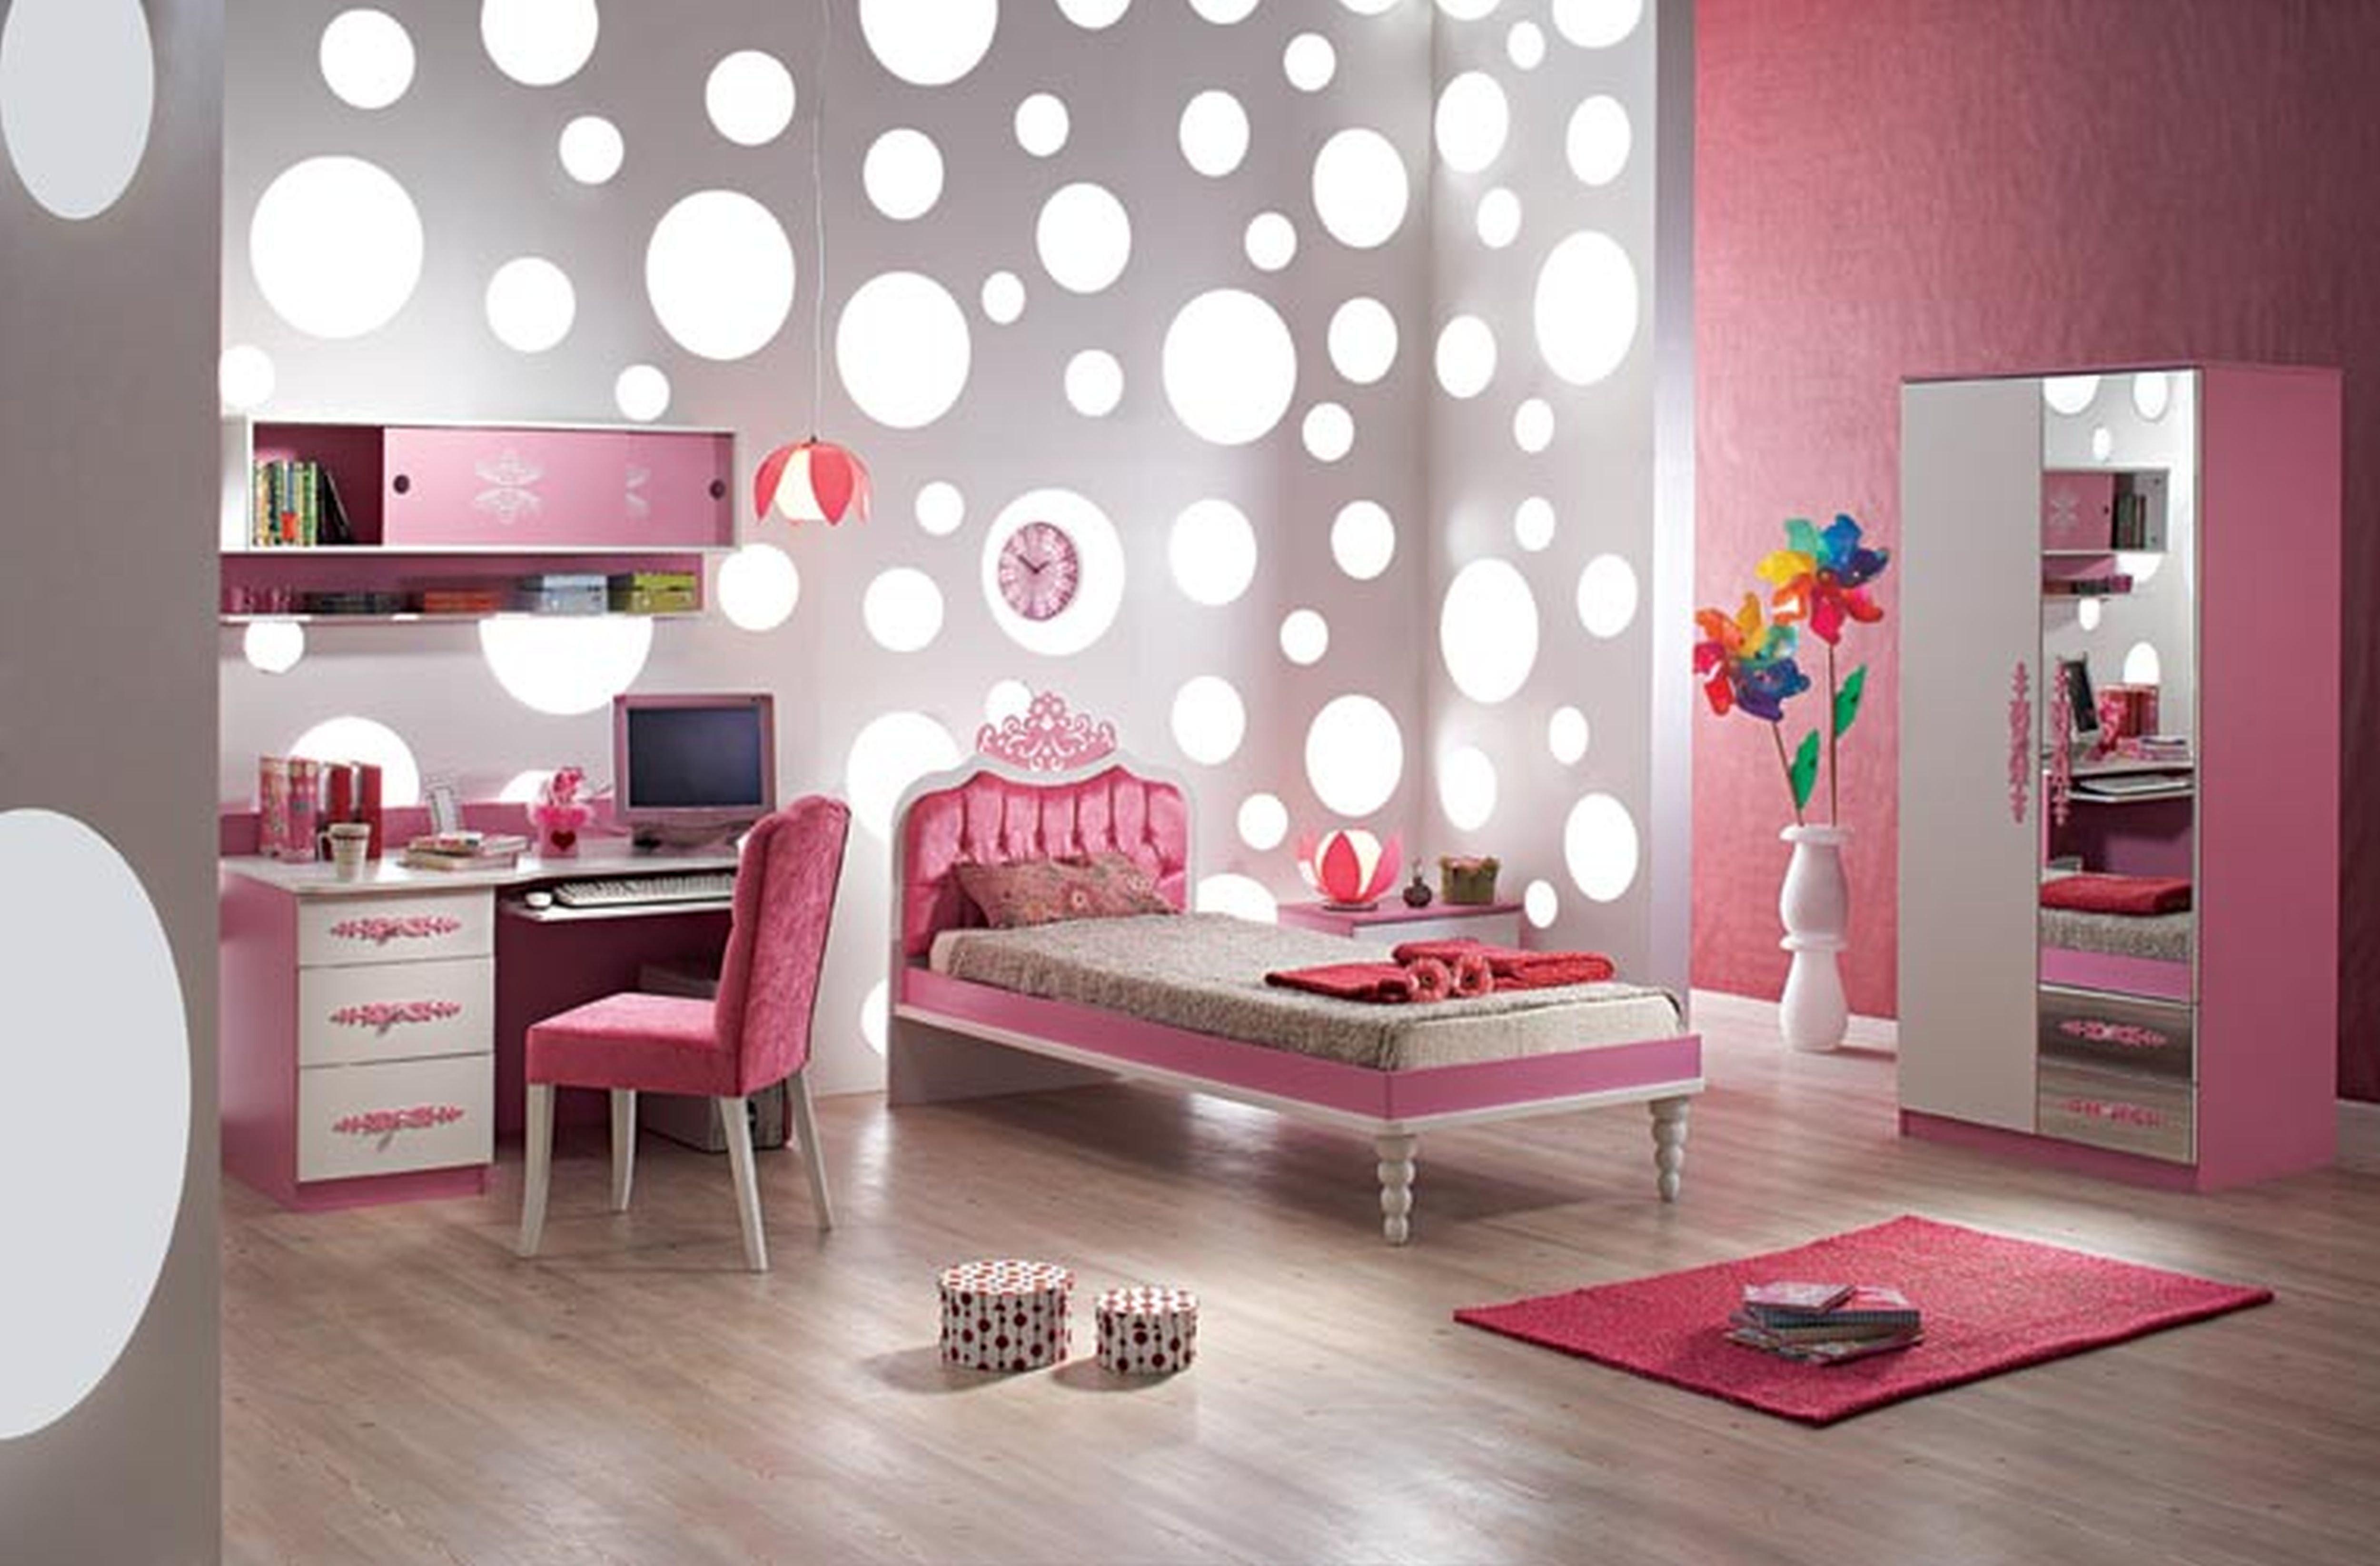 10 Nice Cute Little Girl Room Ideas gallery of cute little girl bedroom ideas e mvbjournal cute little 2020